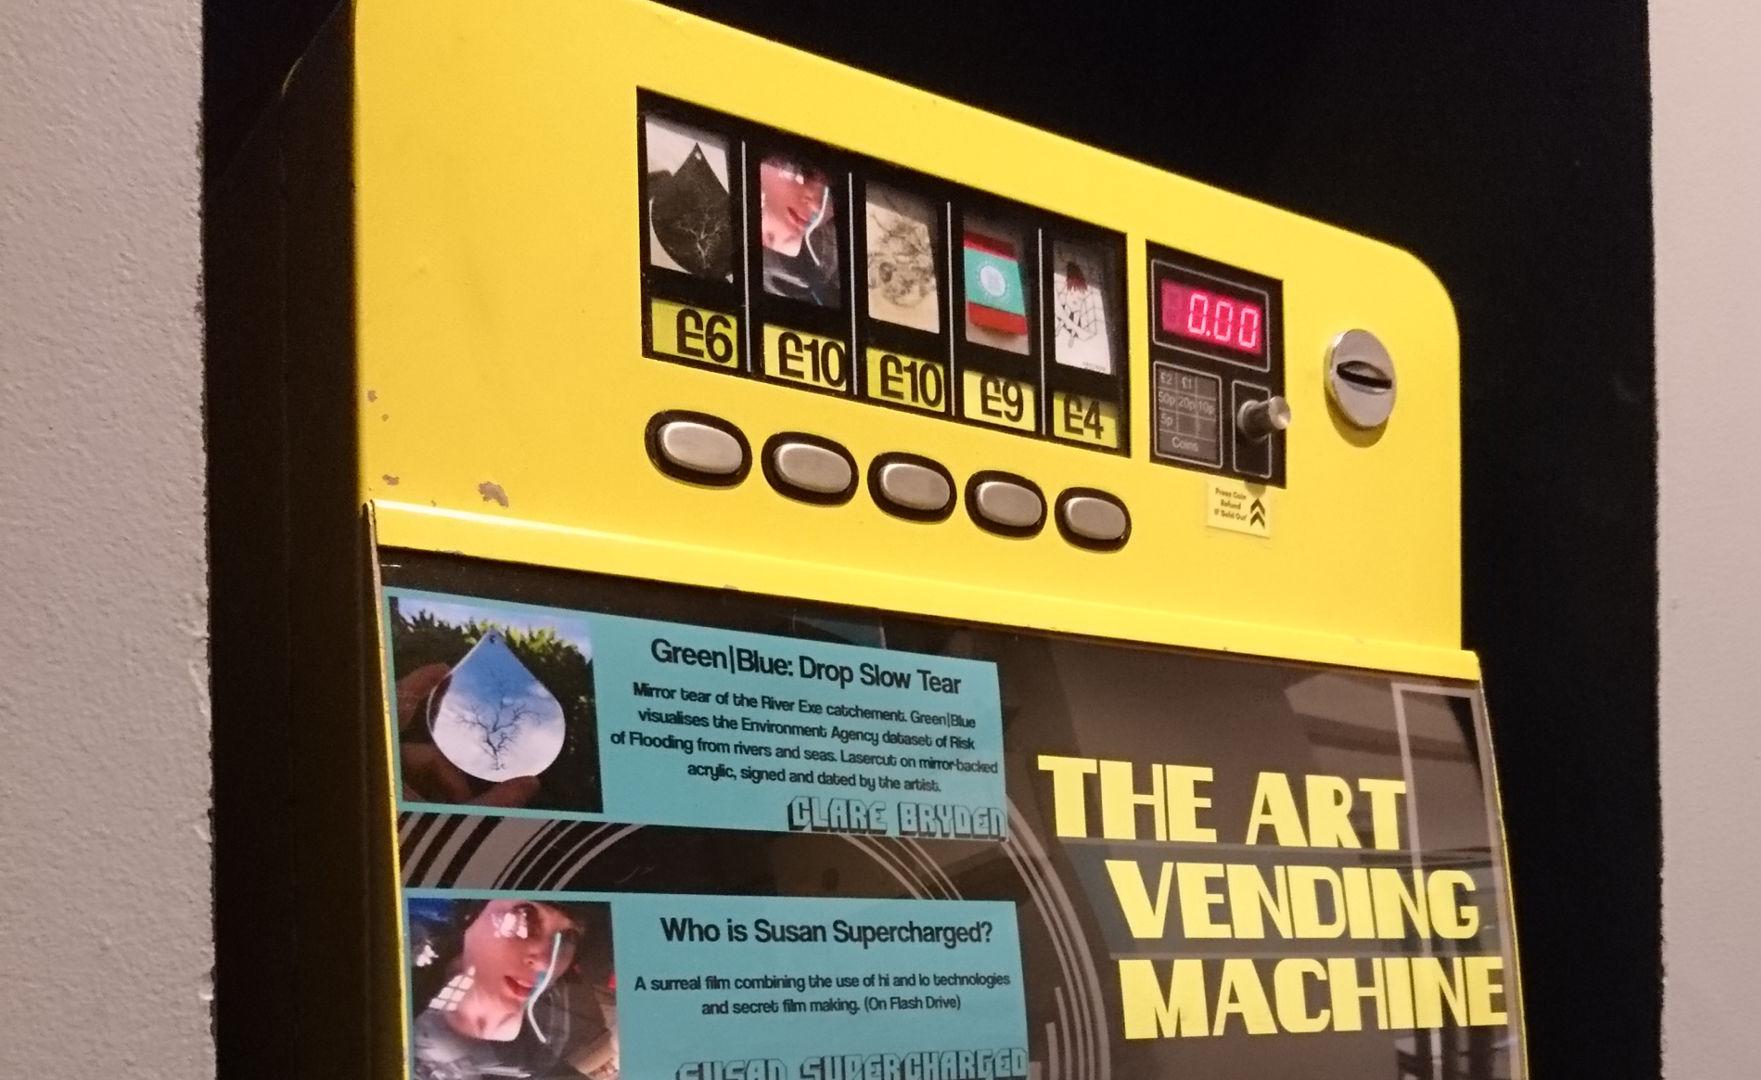 The Art Vending Machine, November 2017